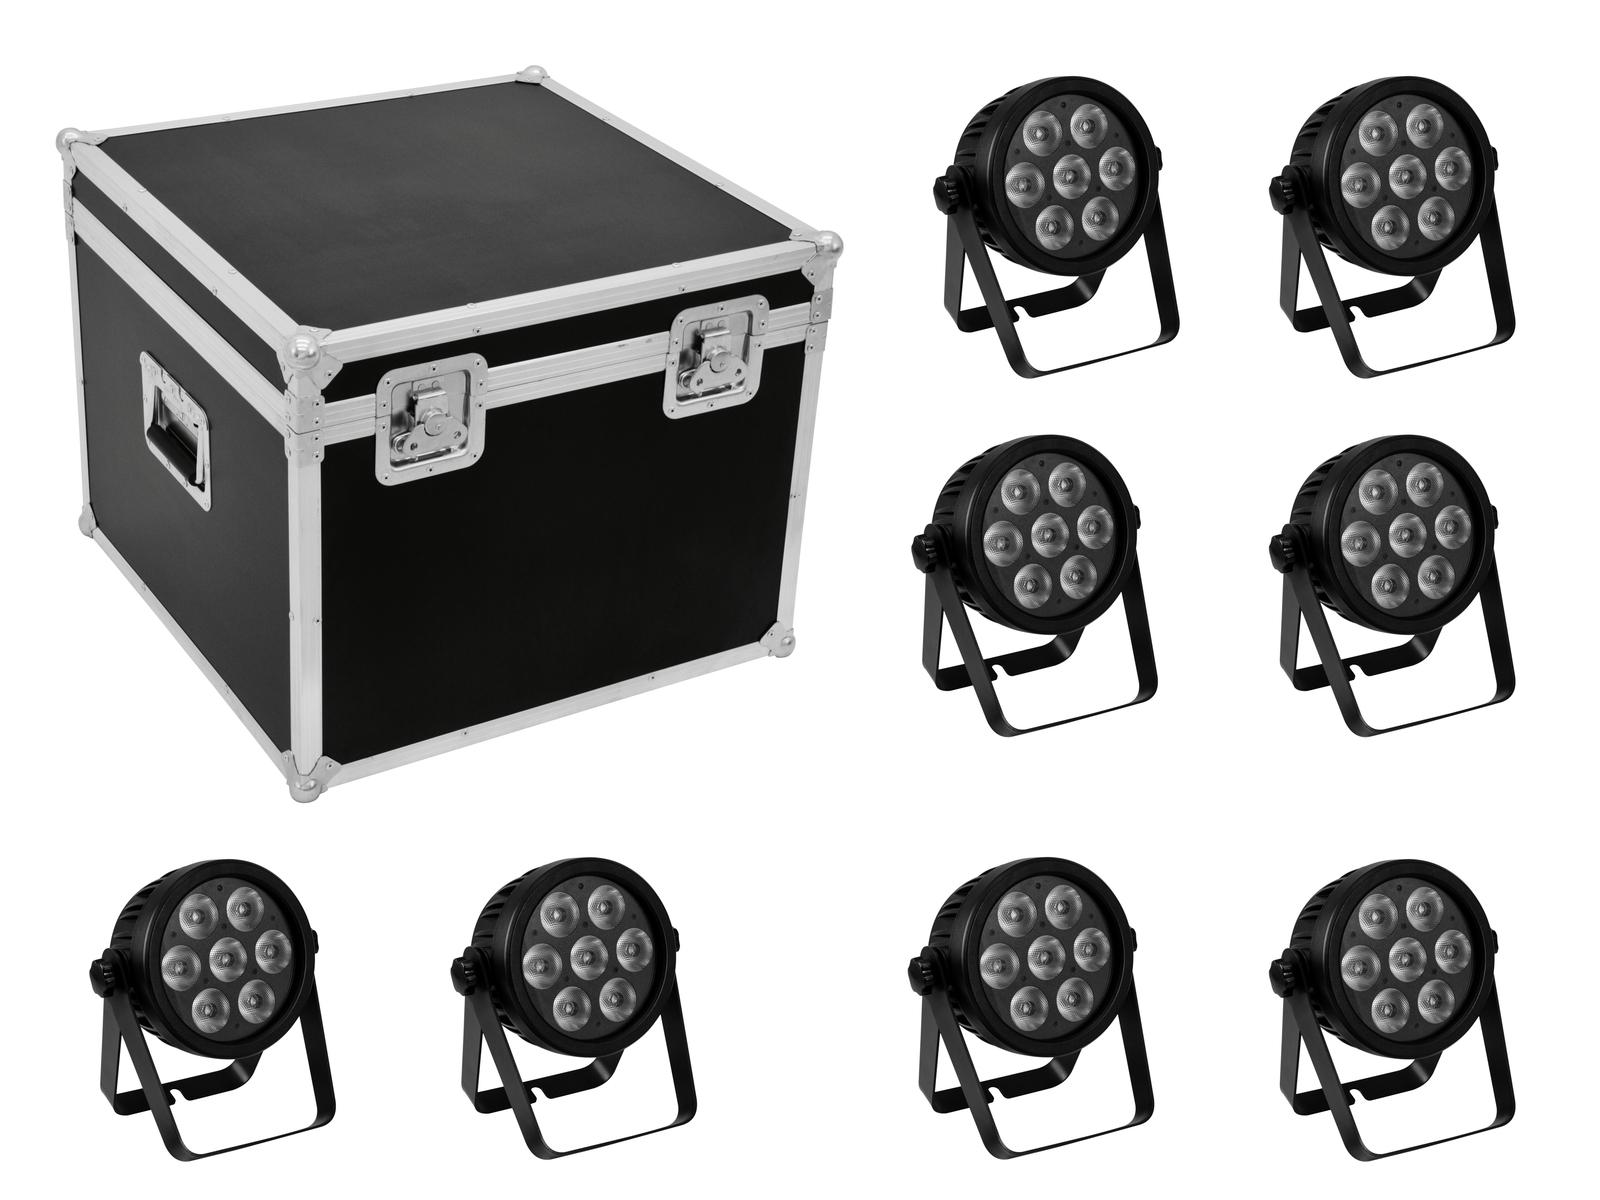 EUROLITE Set 8x LED 7C-7 Silent Slim Spot + Case